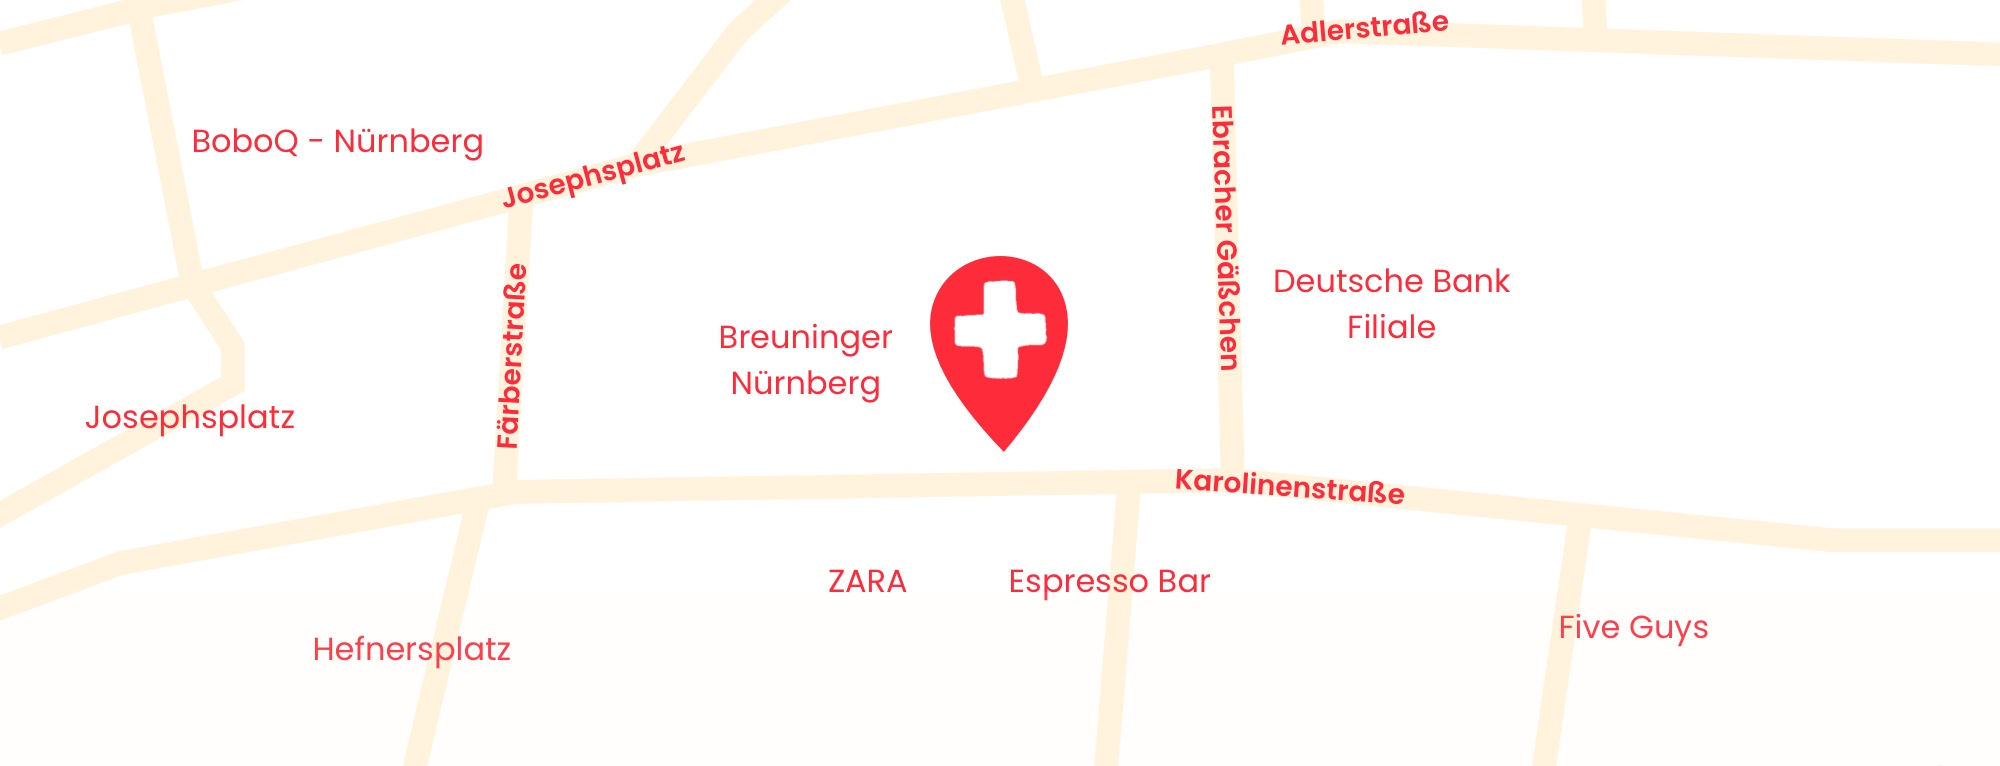 Just for fund Spendenaktion Künstler:innen Event Karolinenstraße